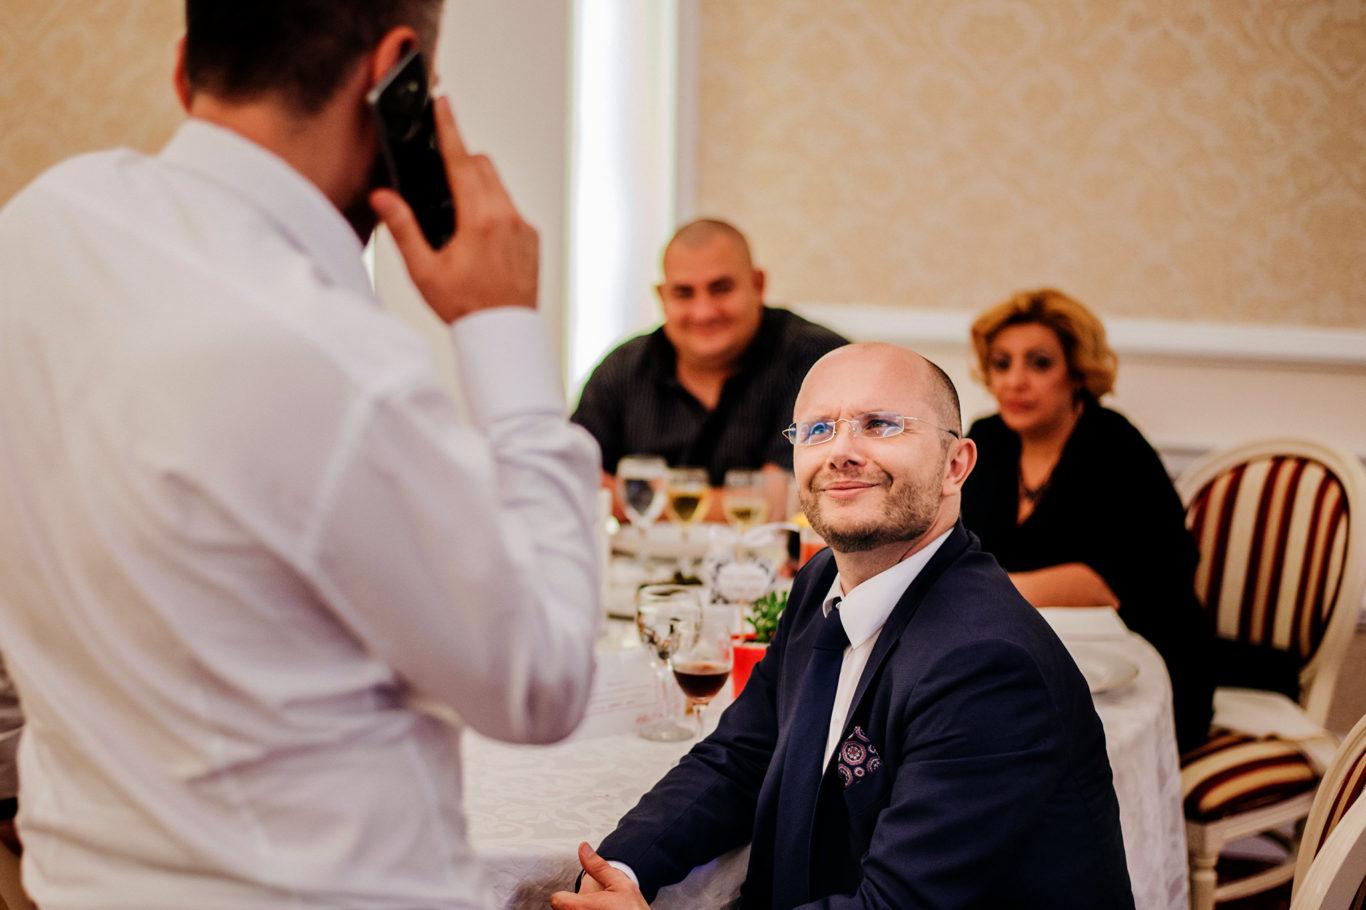 0717-fotografie-nunta-bucuresti-anca-george-fotograf-ciprian-dumitrescu-dsc_9582